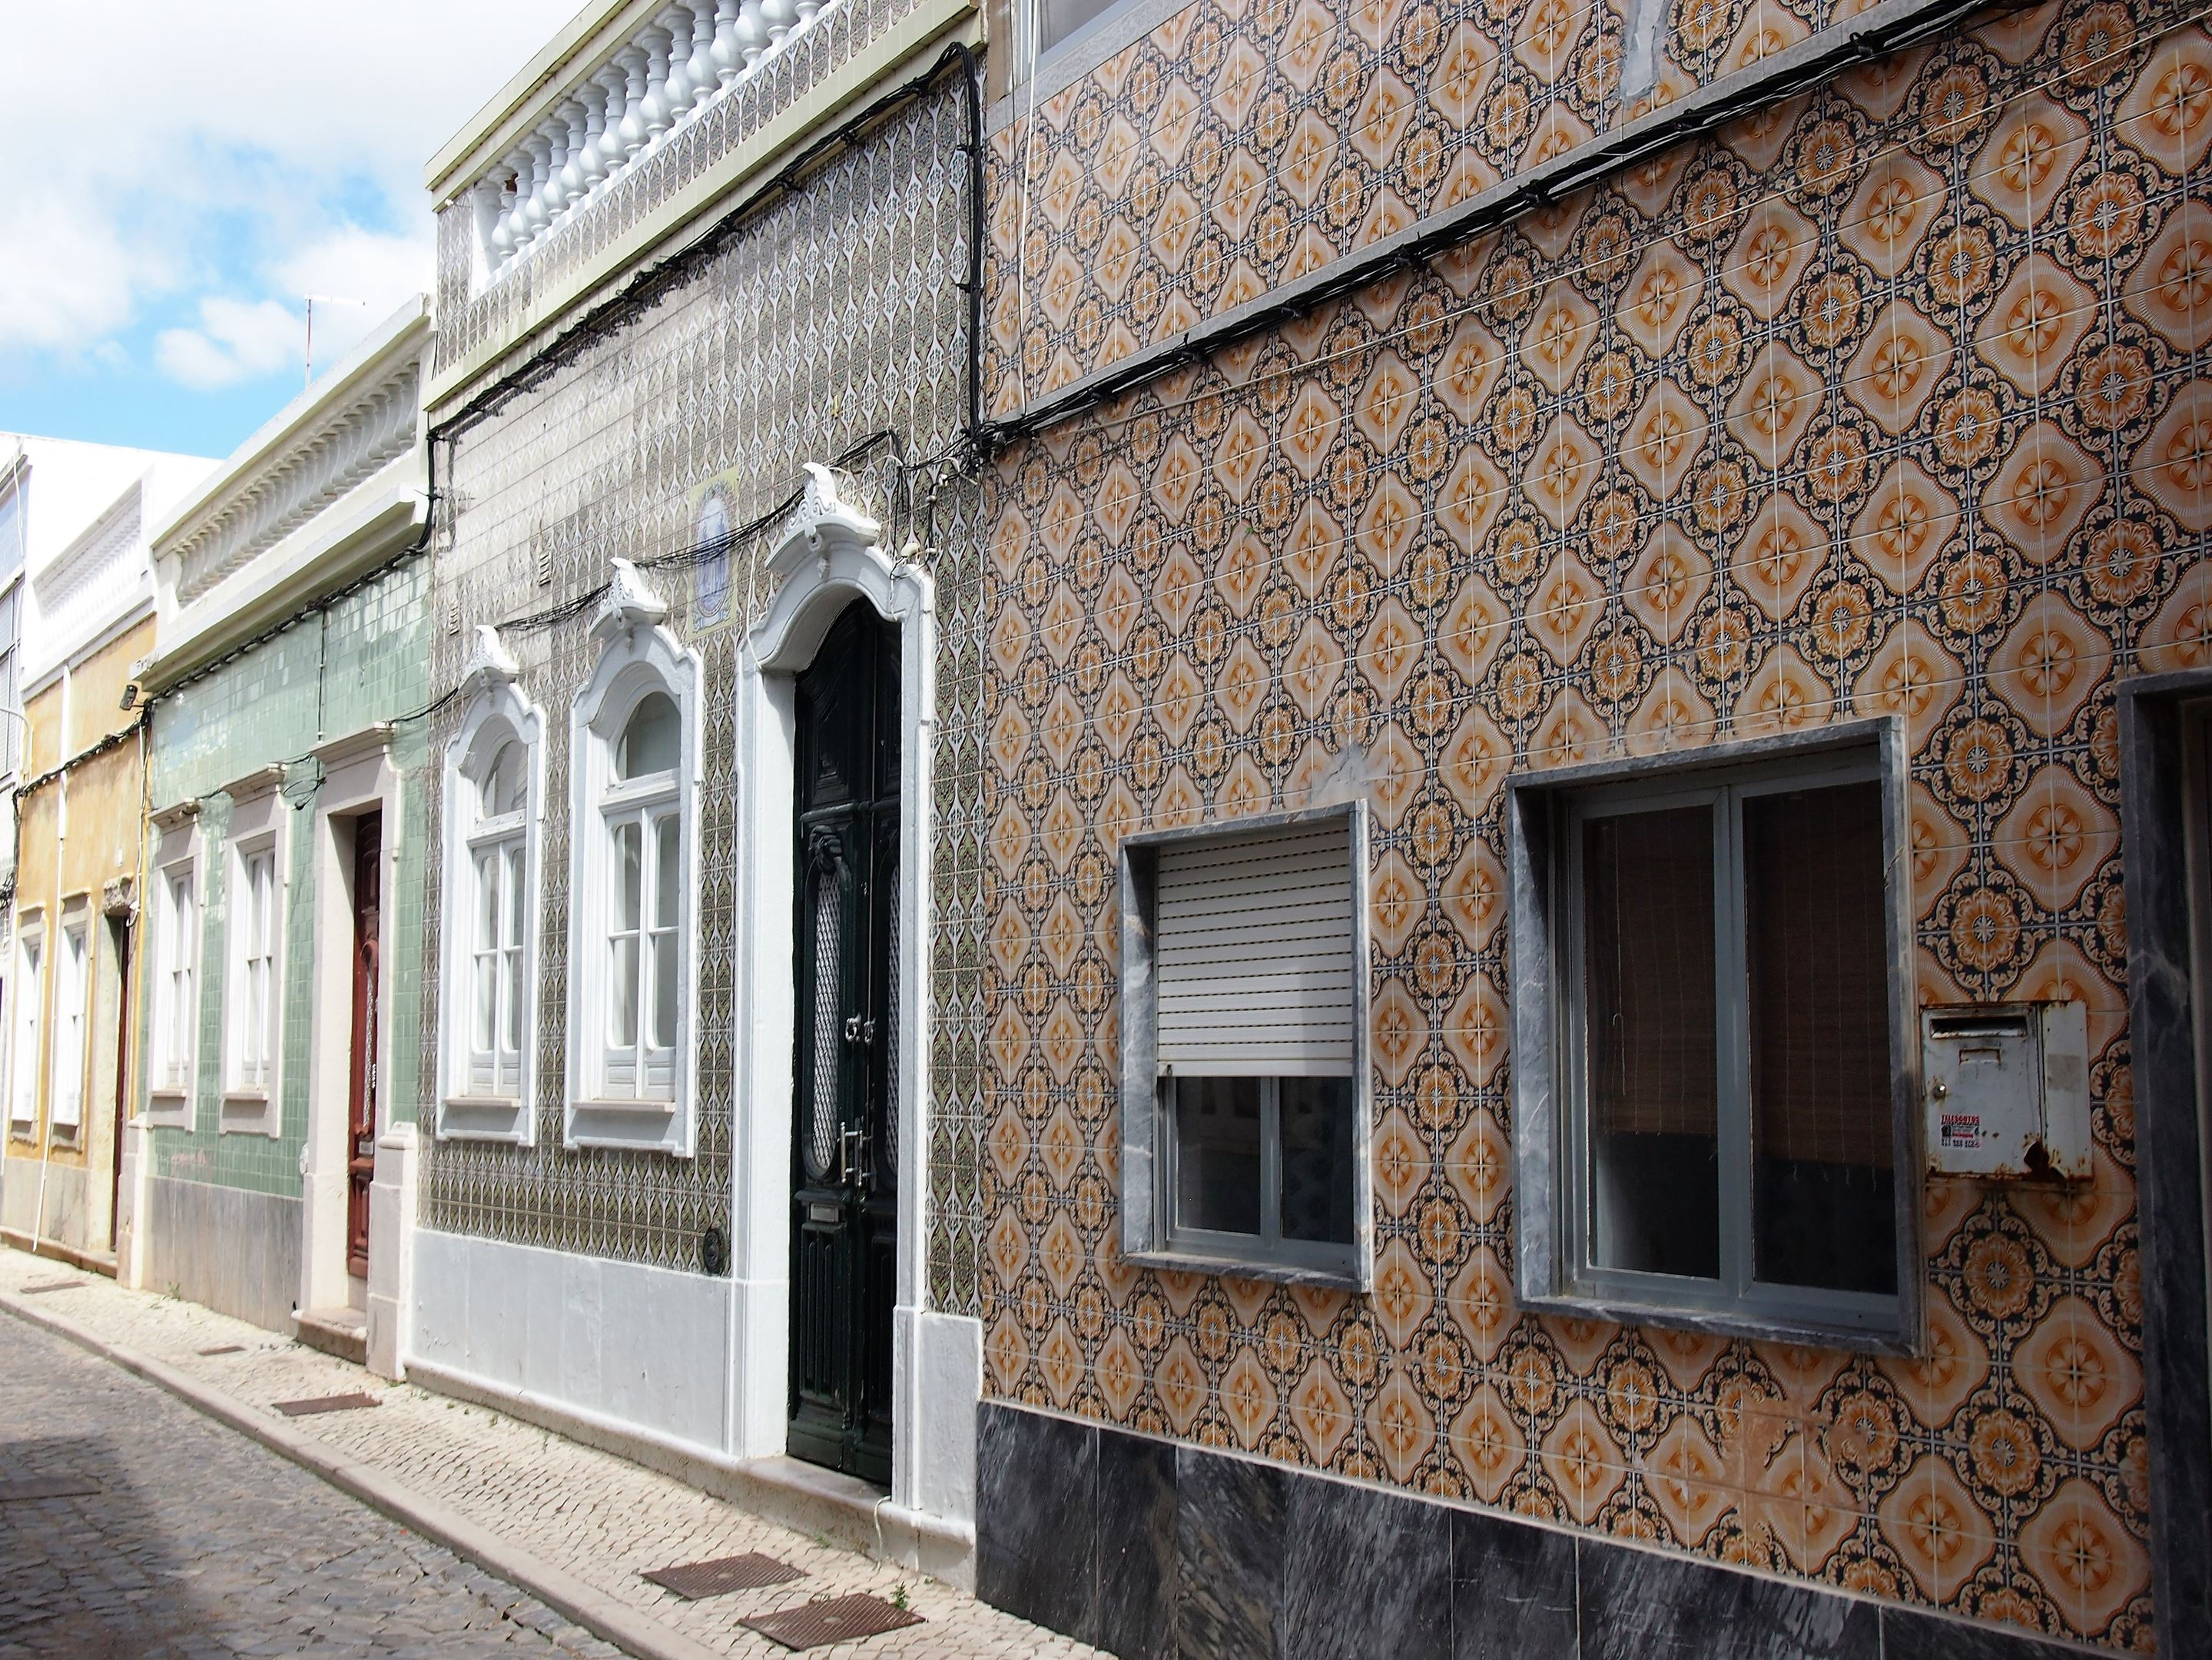 Typical Algarvean houses covered in tiles in Olhão, Algarve